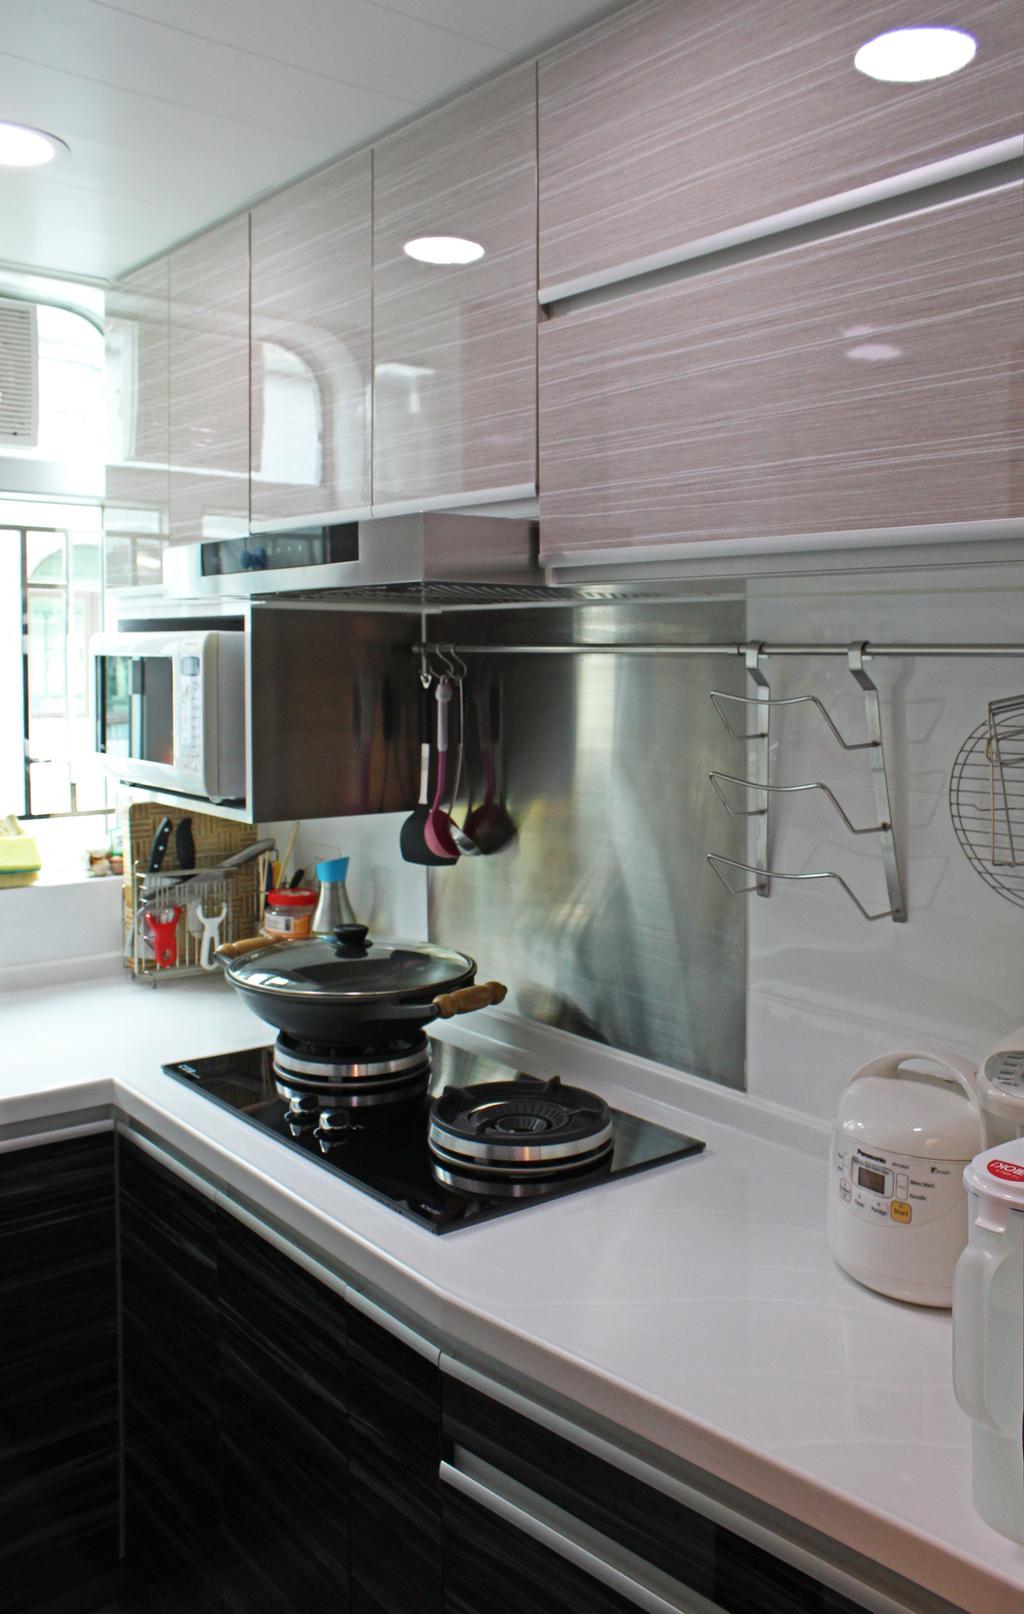 公屋/居屋, 廚房, 灰窰下村, 室內設計師, CREATIVE Interior Design Engineering, Appliance, Electrical Device, Microwave, Oven